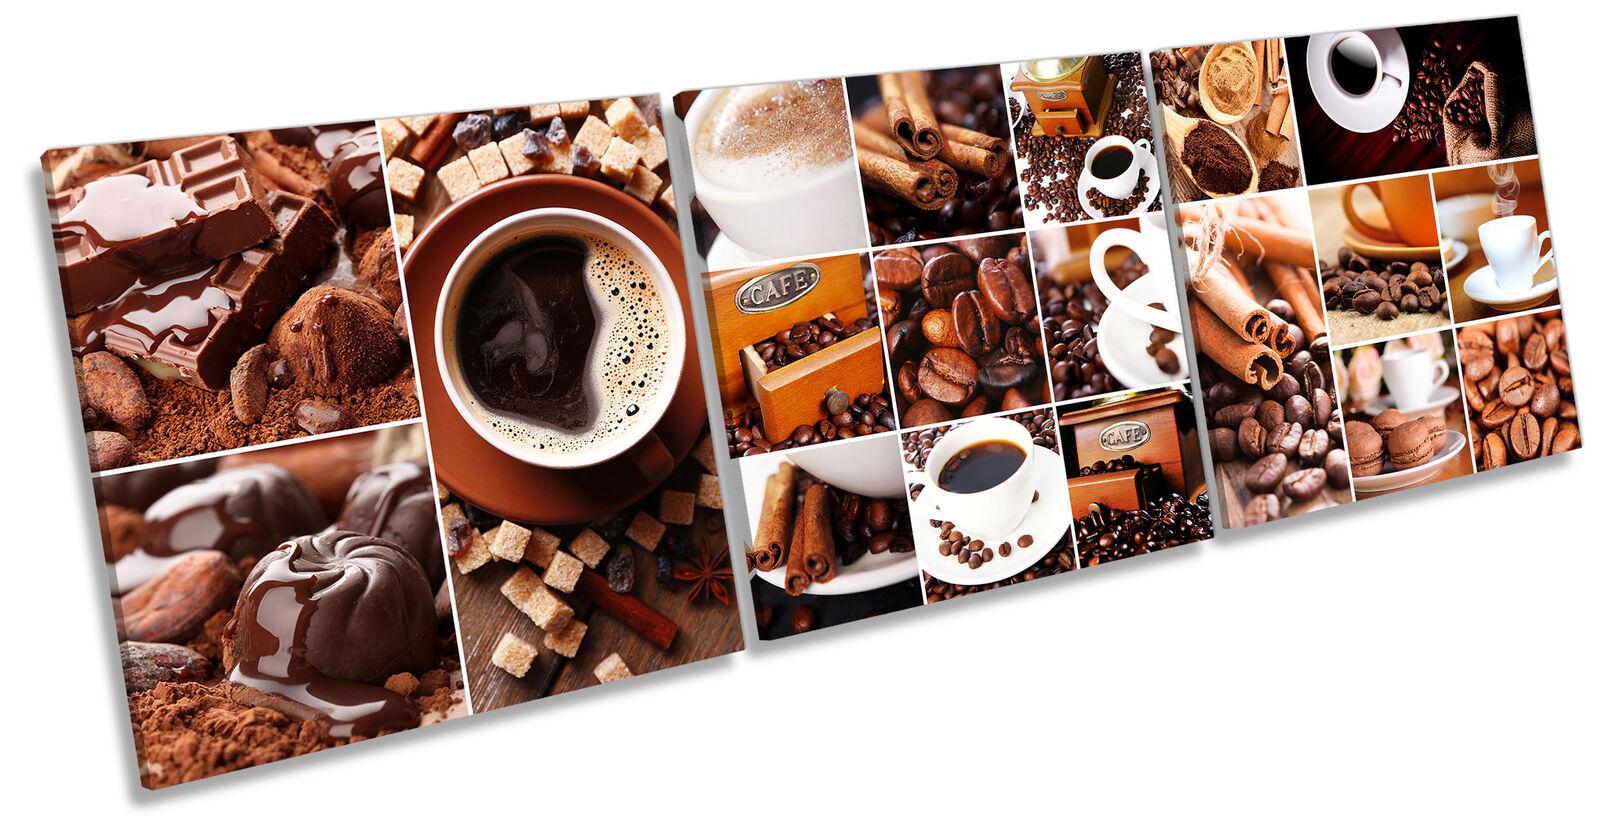 Coffee Shop Kitchen Set of 3 CANVAS WALL ART Print Treble braun